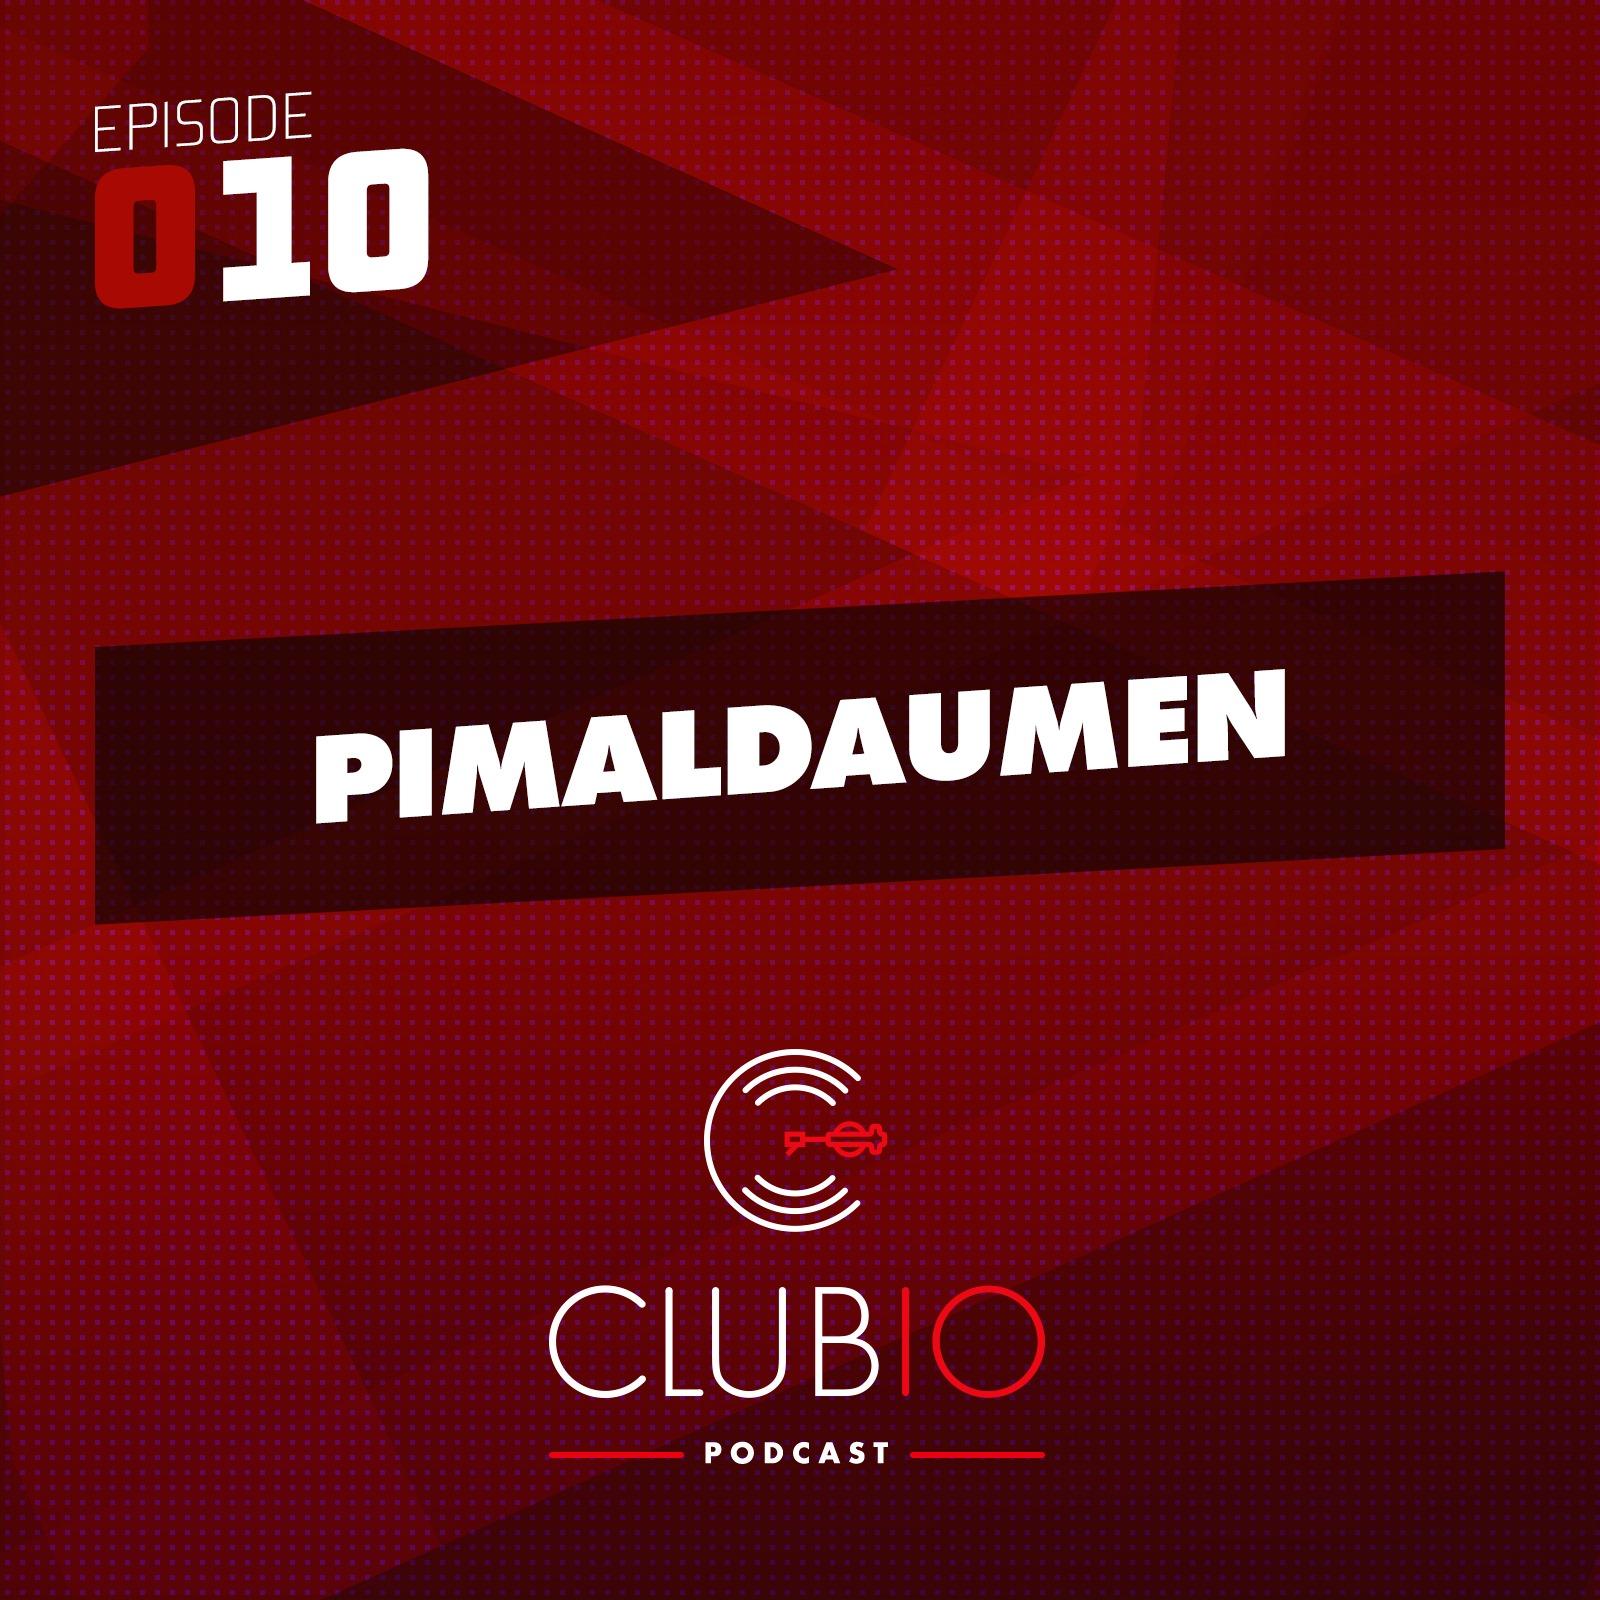 Clubio Podcast 010 - Pimaldaumen